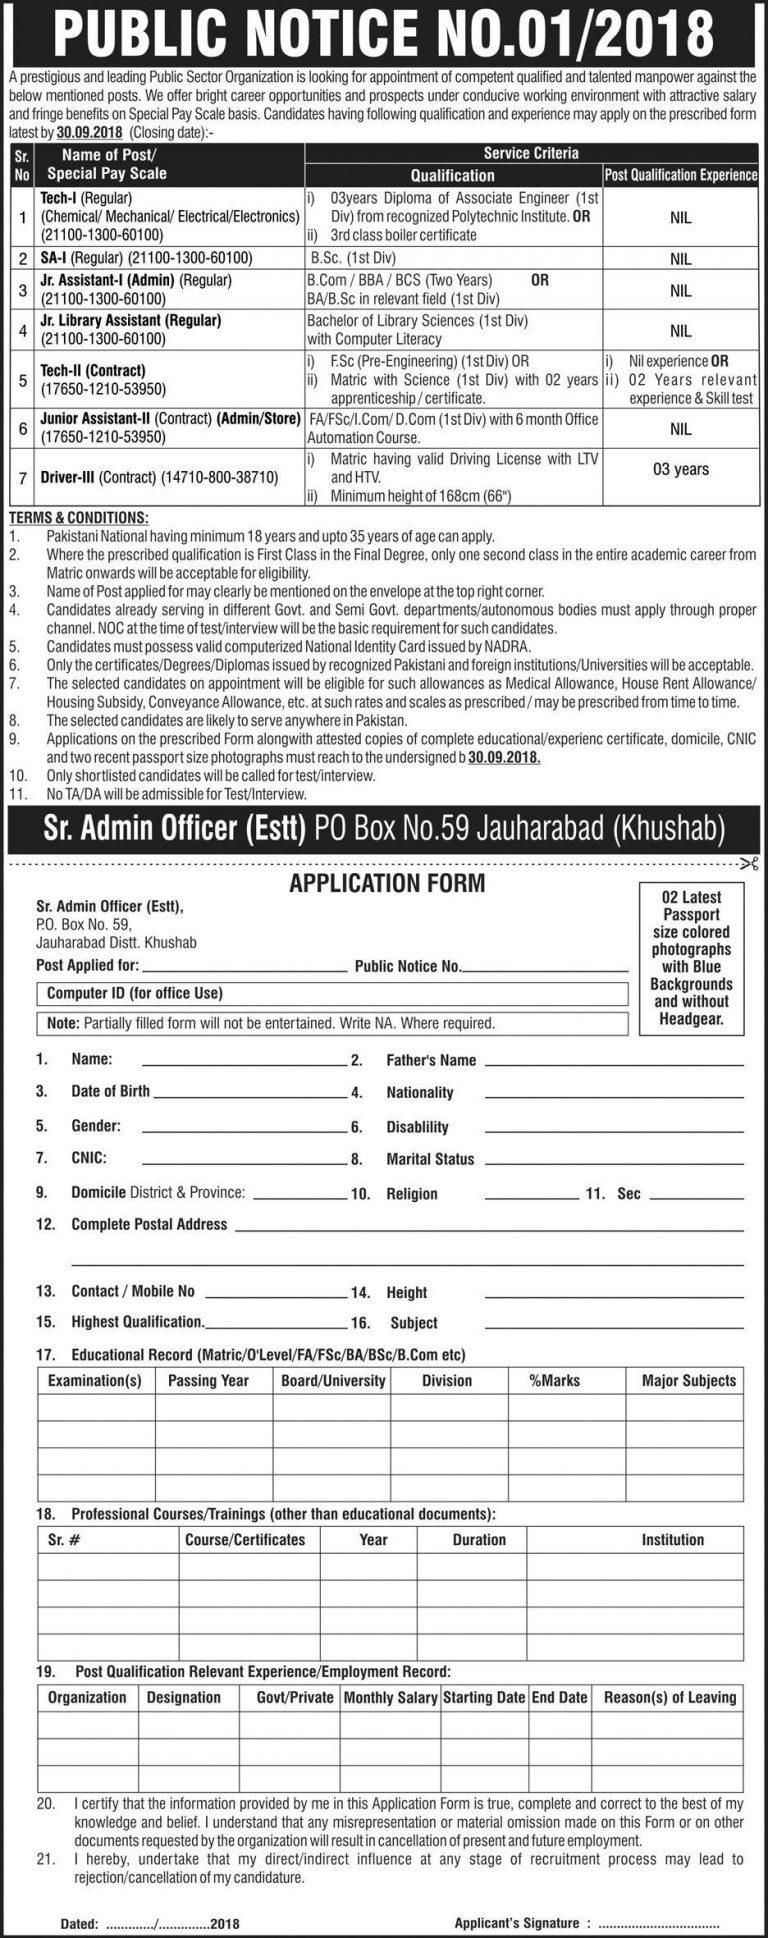 PO Box 59 Jauharabad jobs Sep 2018 Application Form Download Latest